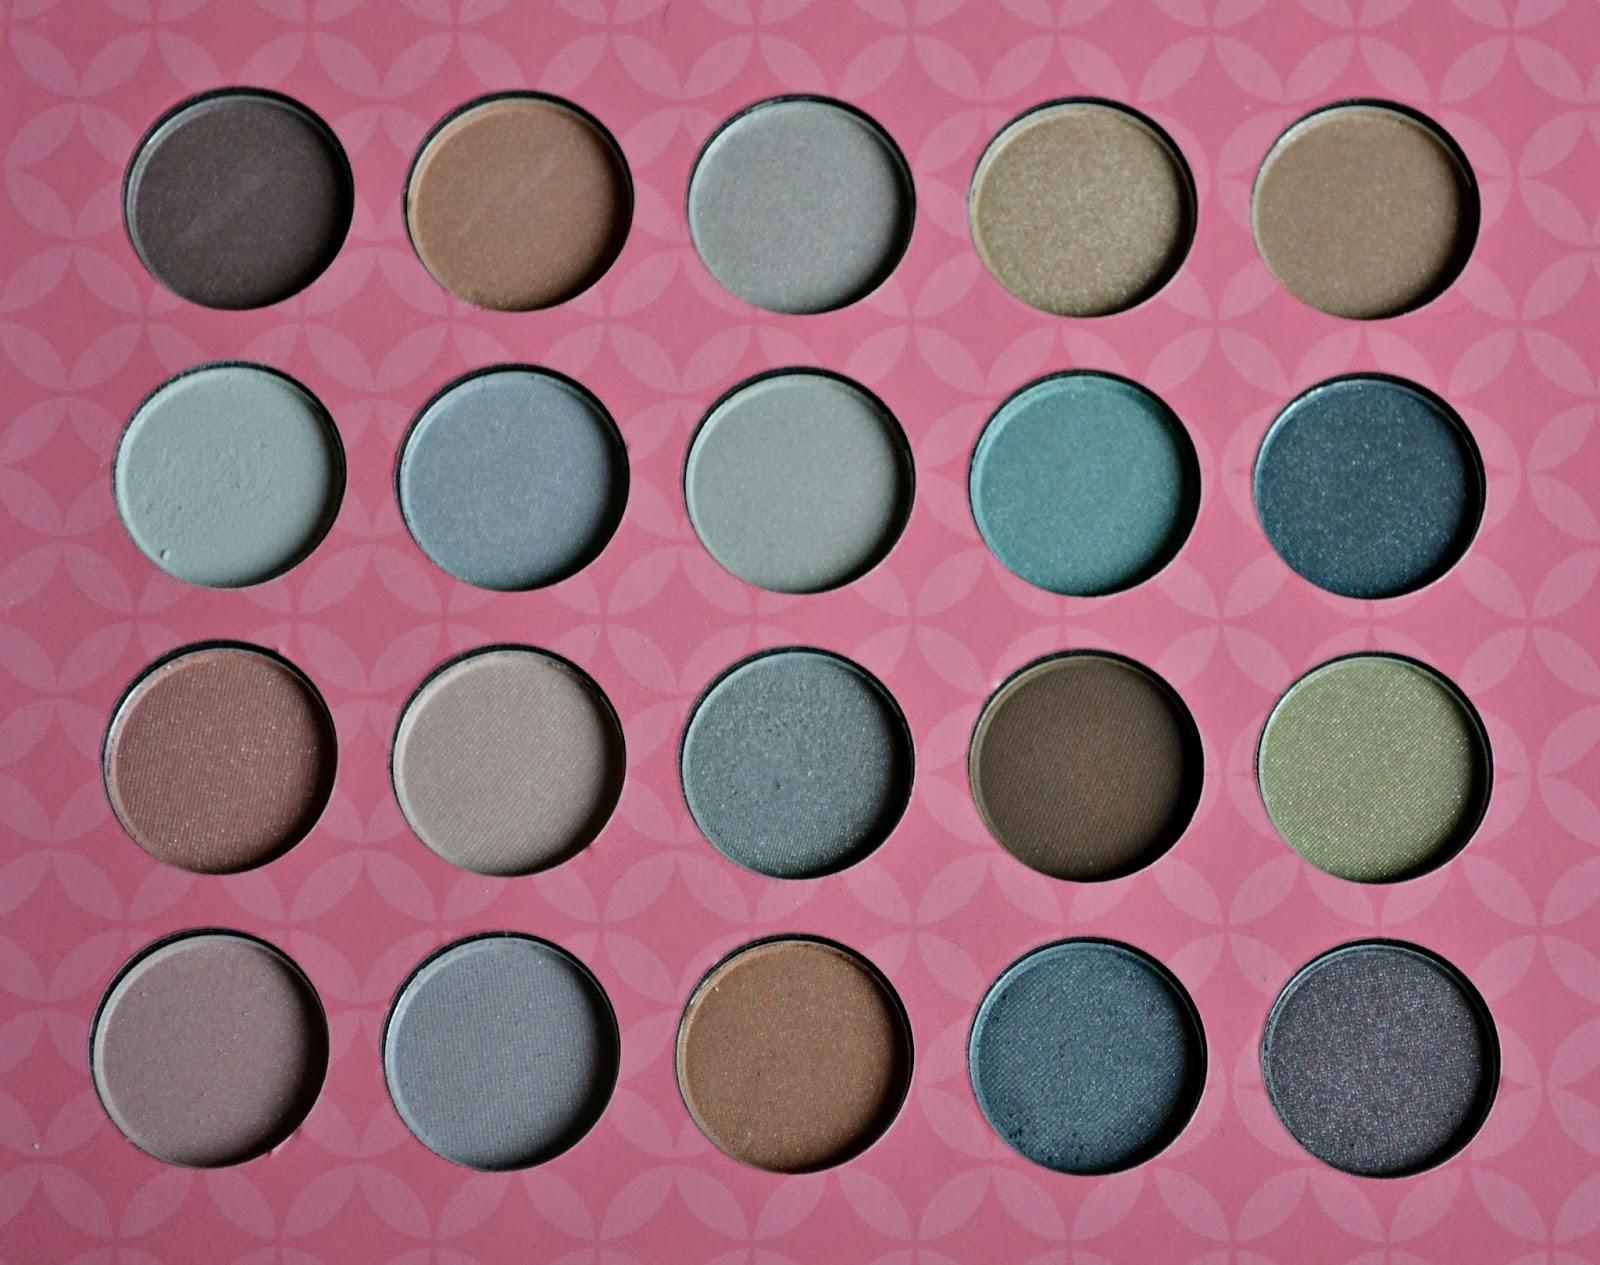 Adore eyeshadow palette